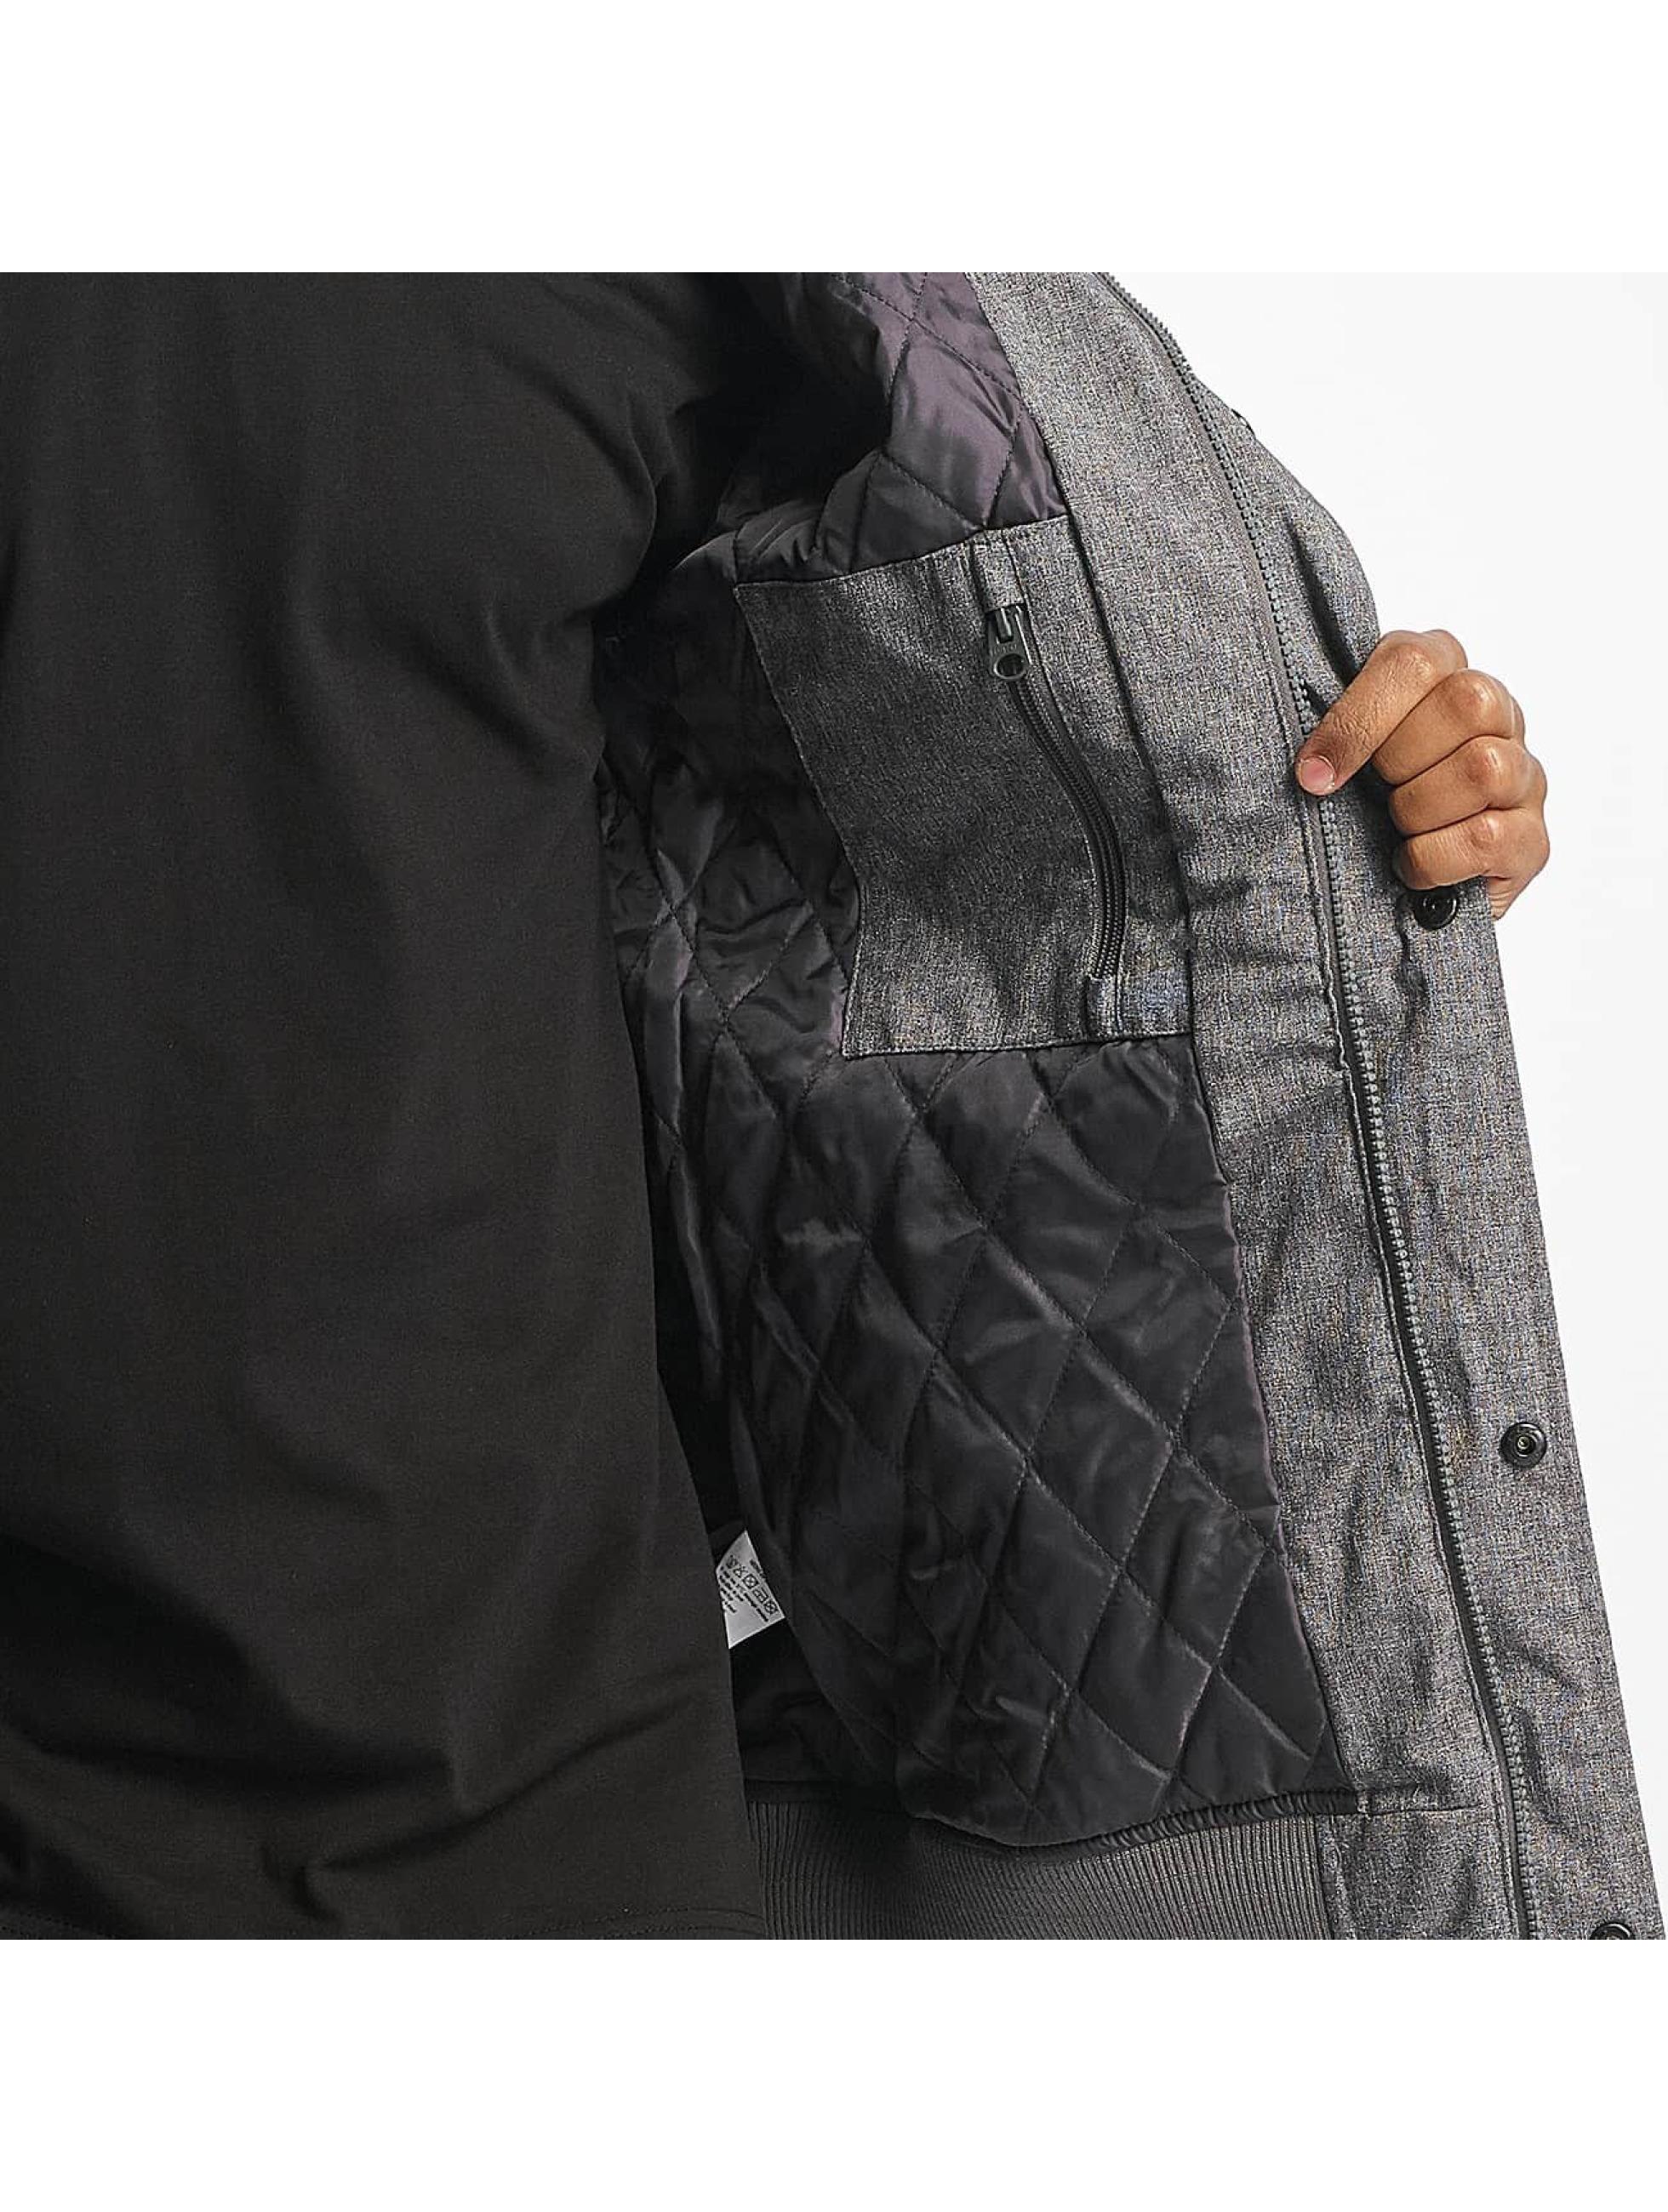 Billabong Winter Jacket All Day 10K gray